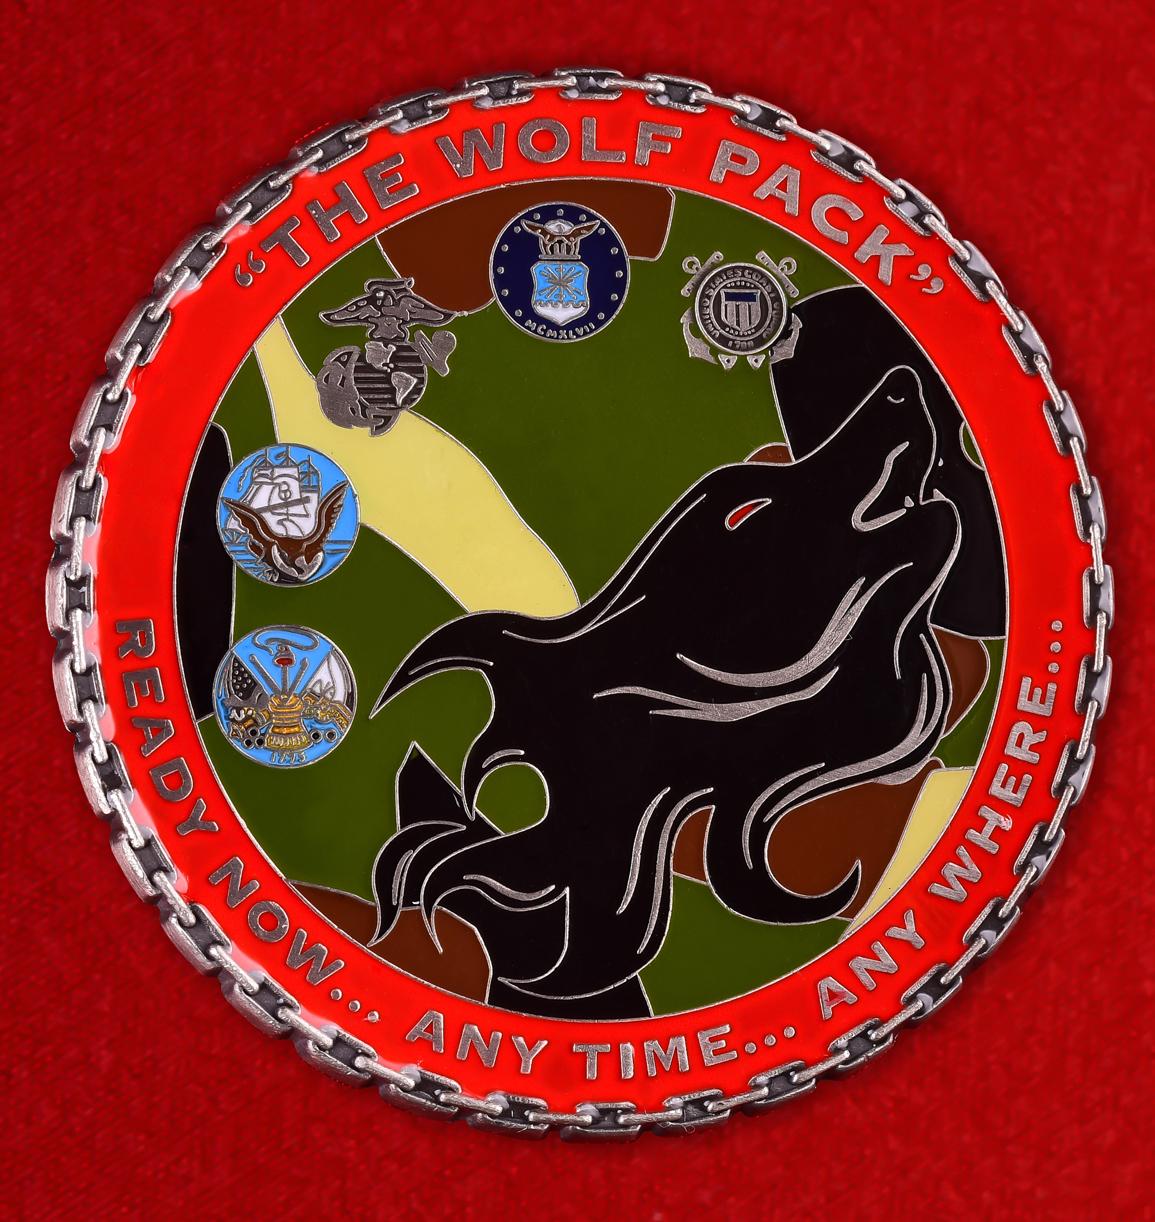 "Знак авиации США ""5-й Батальон грузовых операций авиакомпании г. Бойсе, Айдахо"""